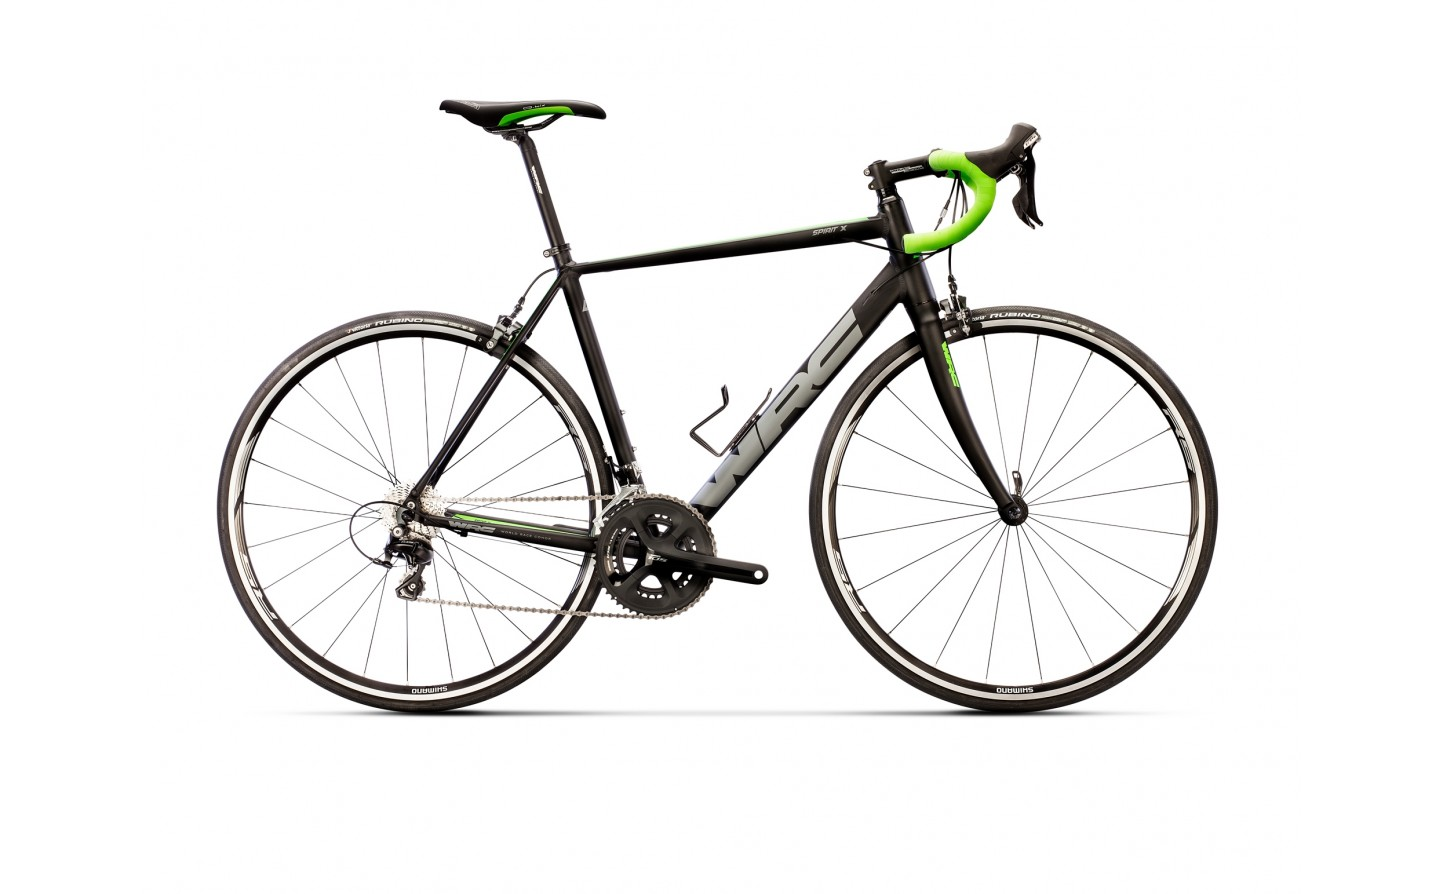 Bicicleta Conor Spirit X 105 700mm